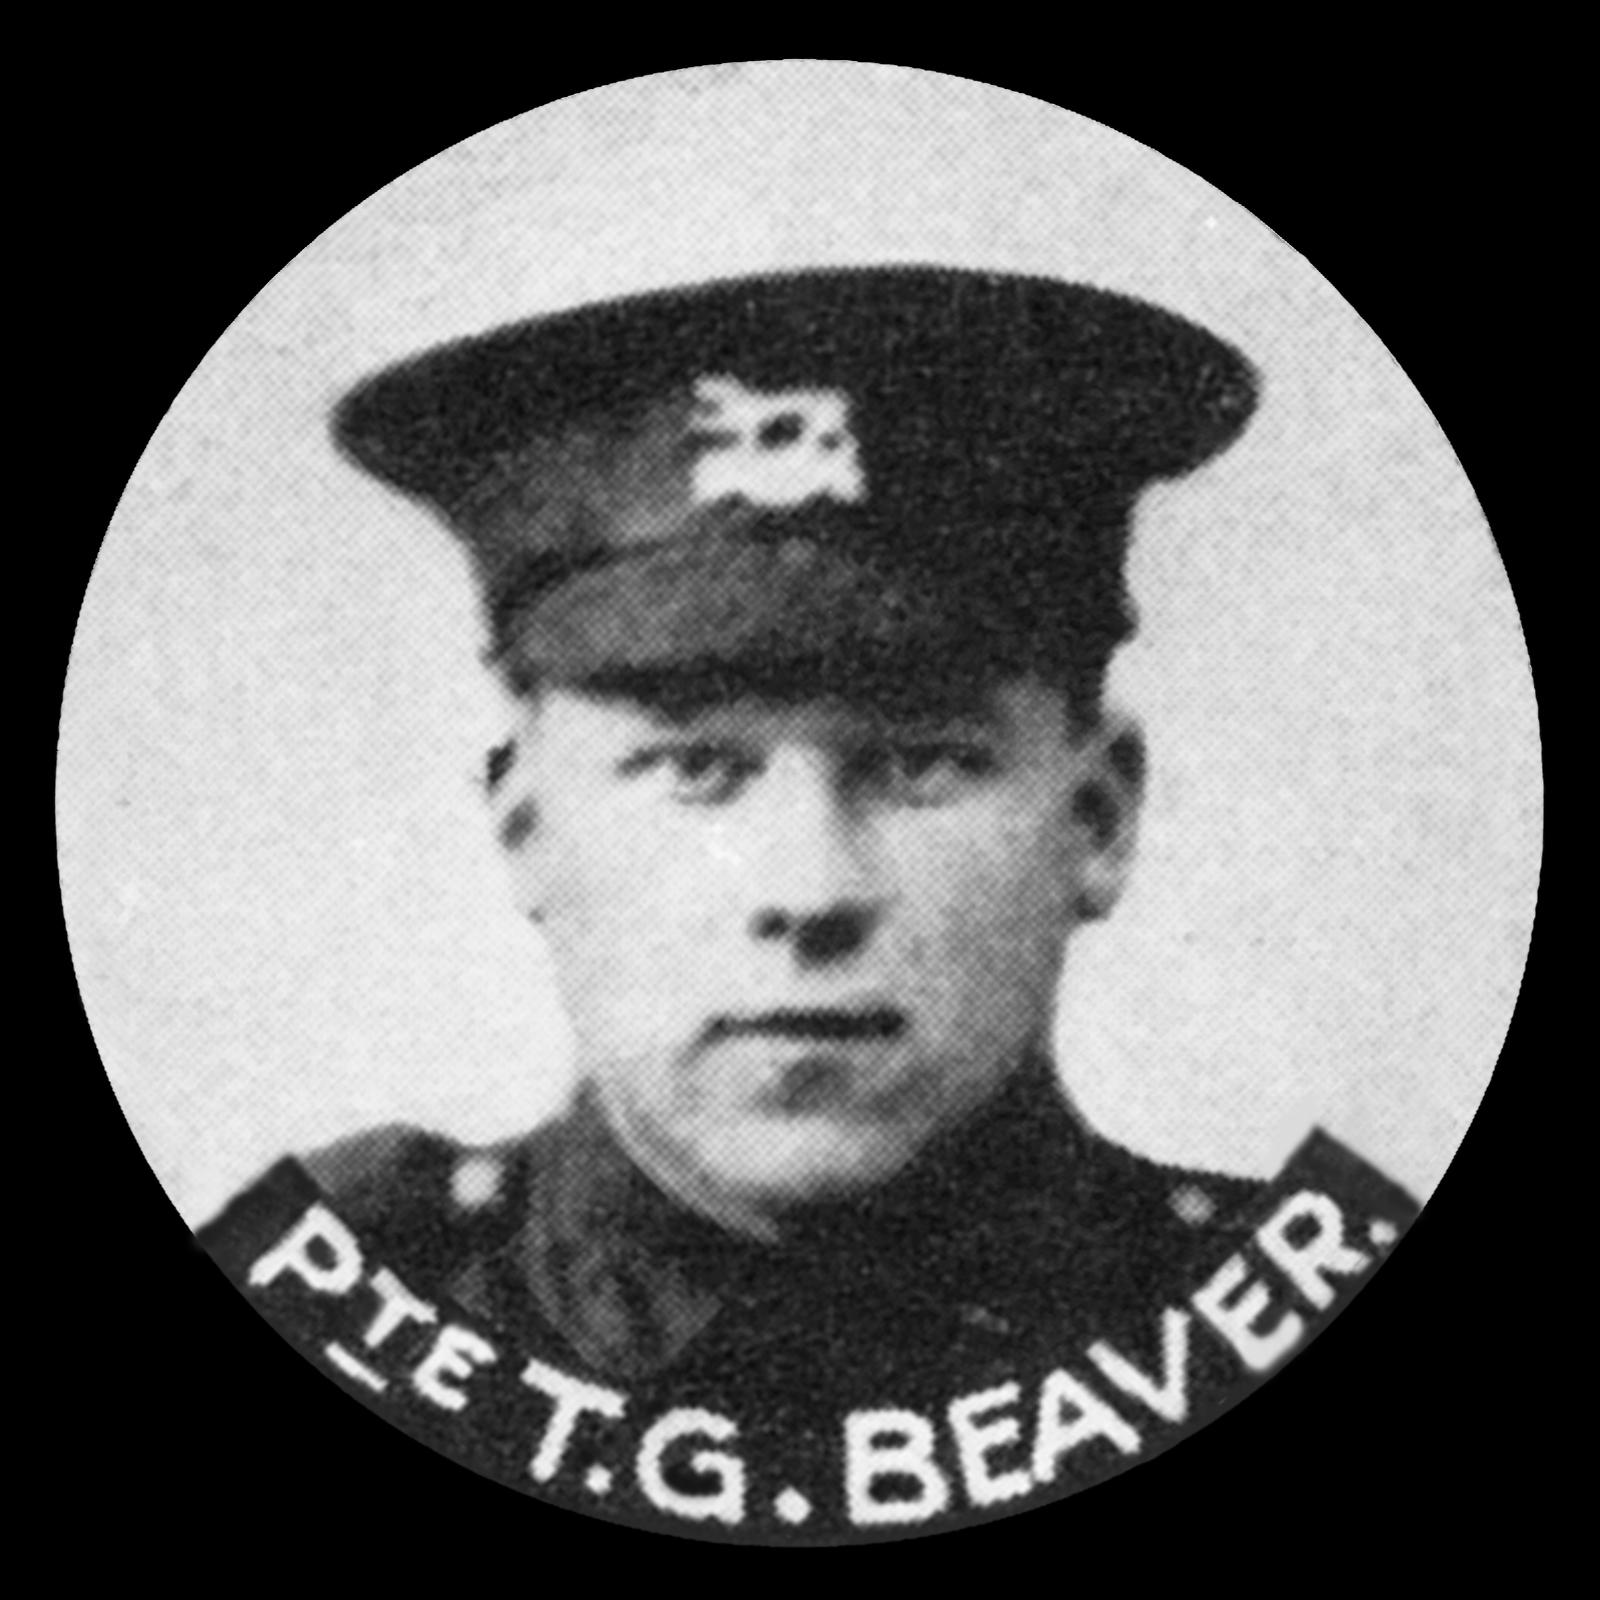 BEAVER Thomas George